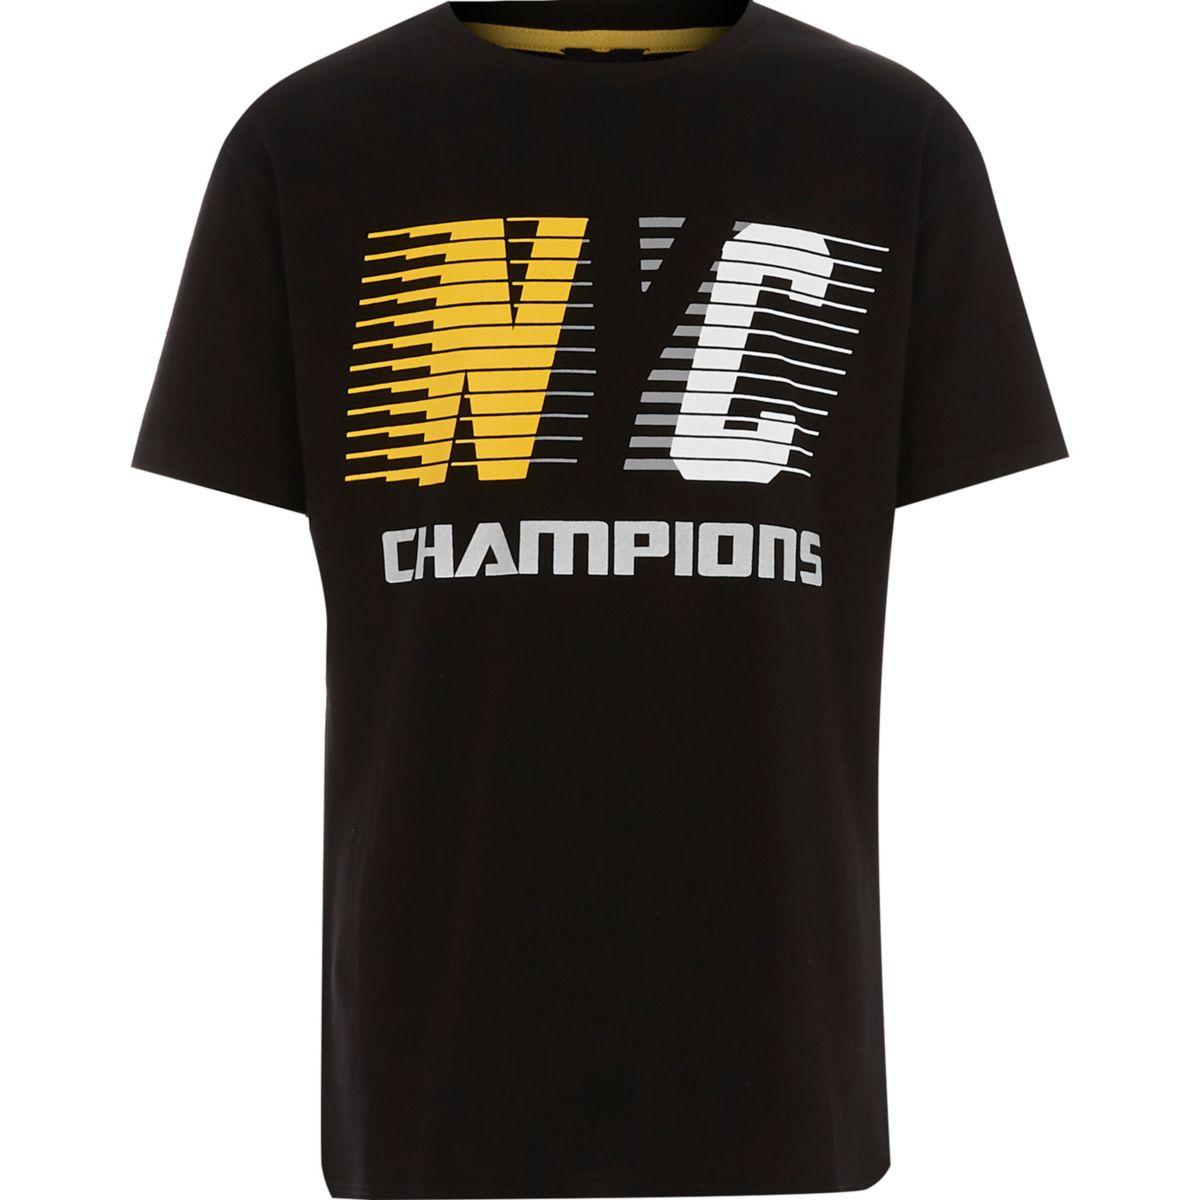 Boys black 'NYC champions' T-shirt